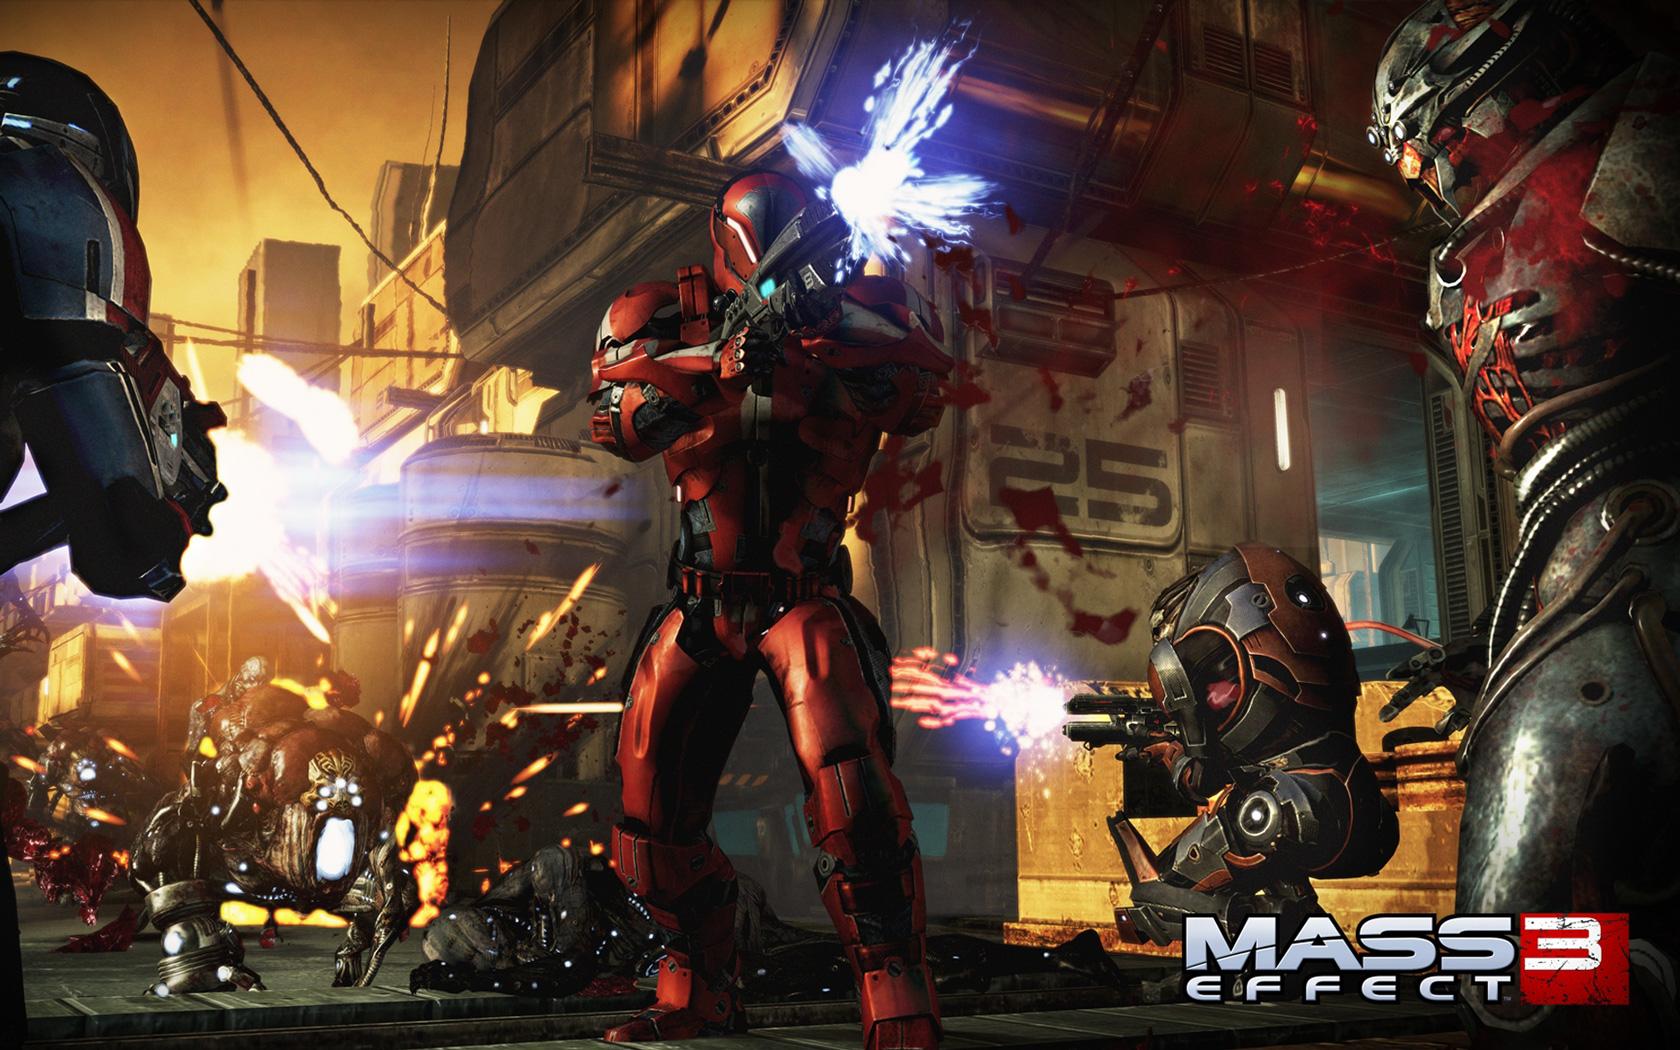 Free Mass Effect 3 Wallpaper in 1680x1050